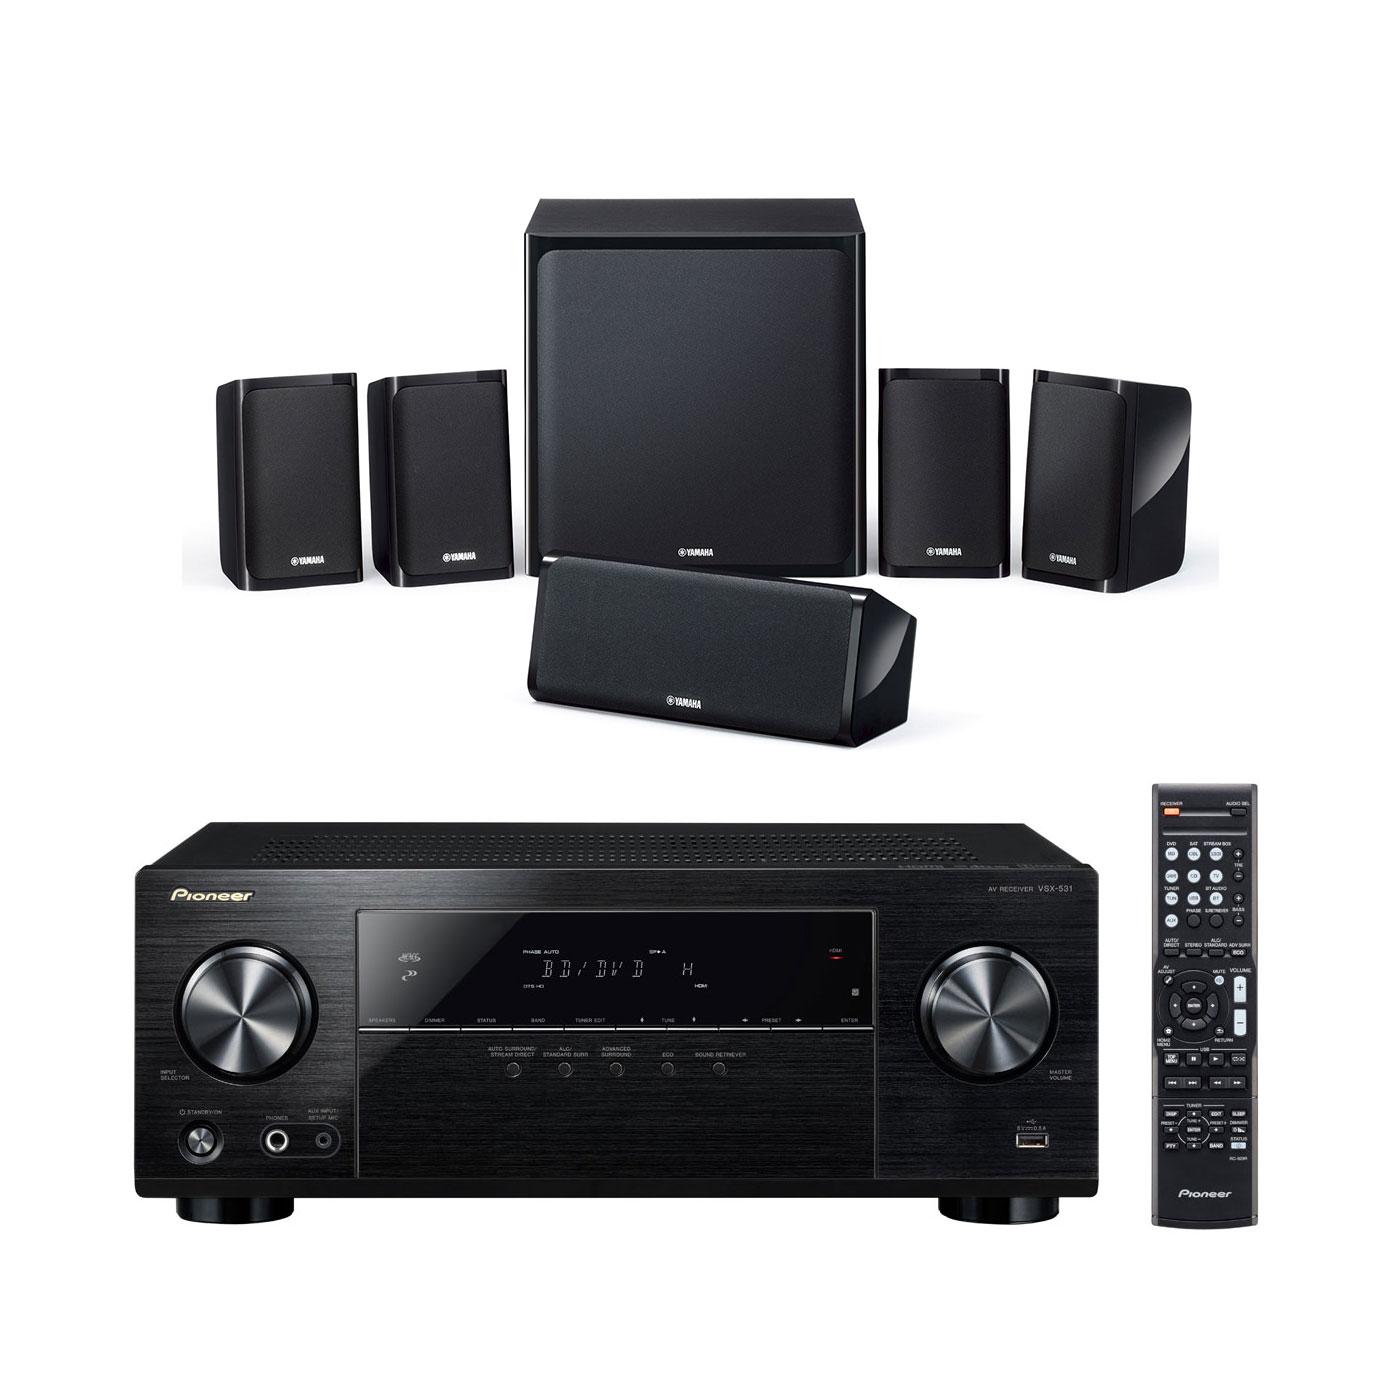 Ensemble home cinéma Pioneer VSX-531B + Yamaha NS-P40 Ampli-tuner Home Cinéma 5.1 Bluetooth, HDCP 2.2, et Upscaling Ultra HD 4K avec 4 entrées HDMI + Pack d'enceintes 5.1